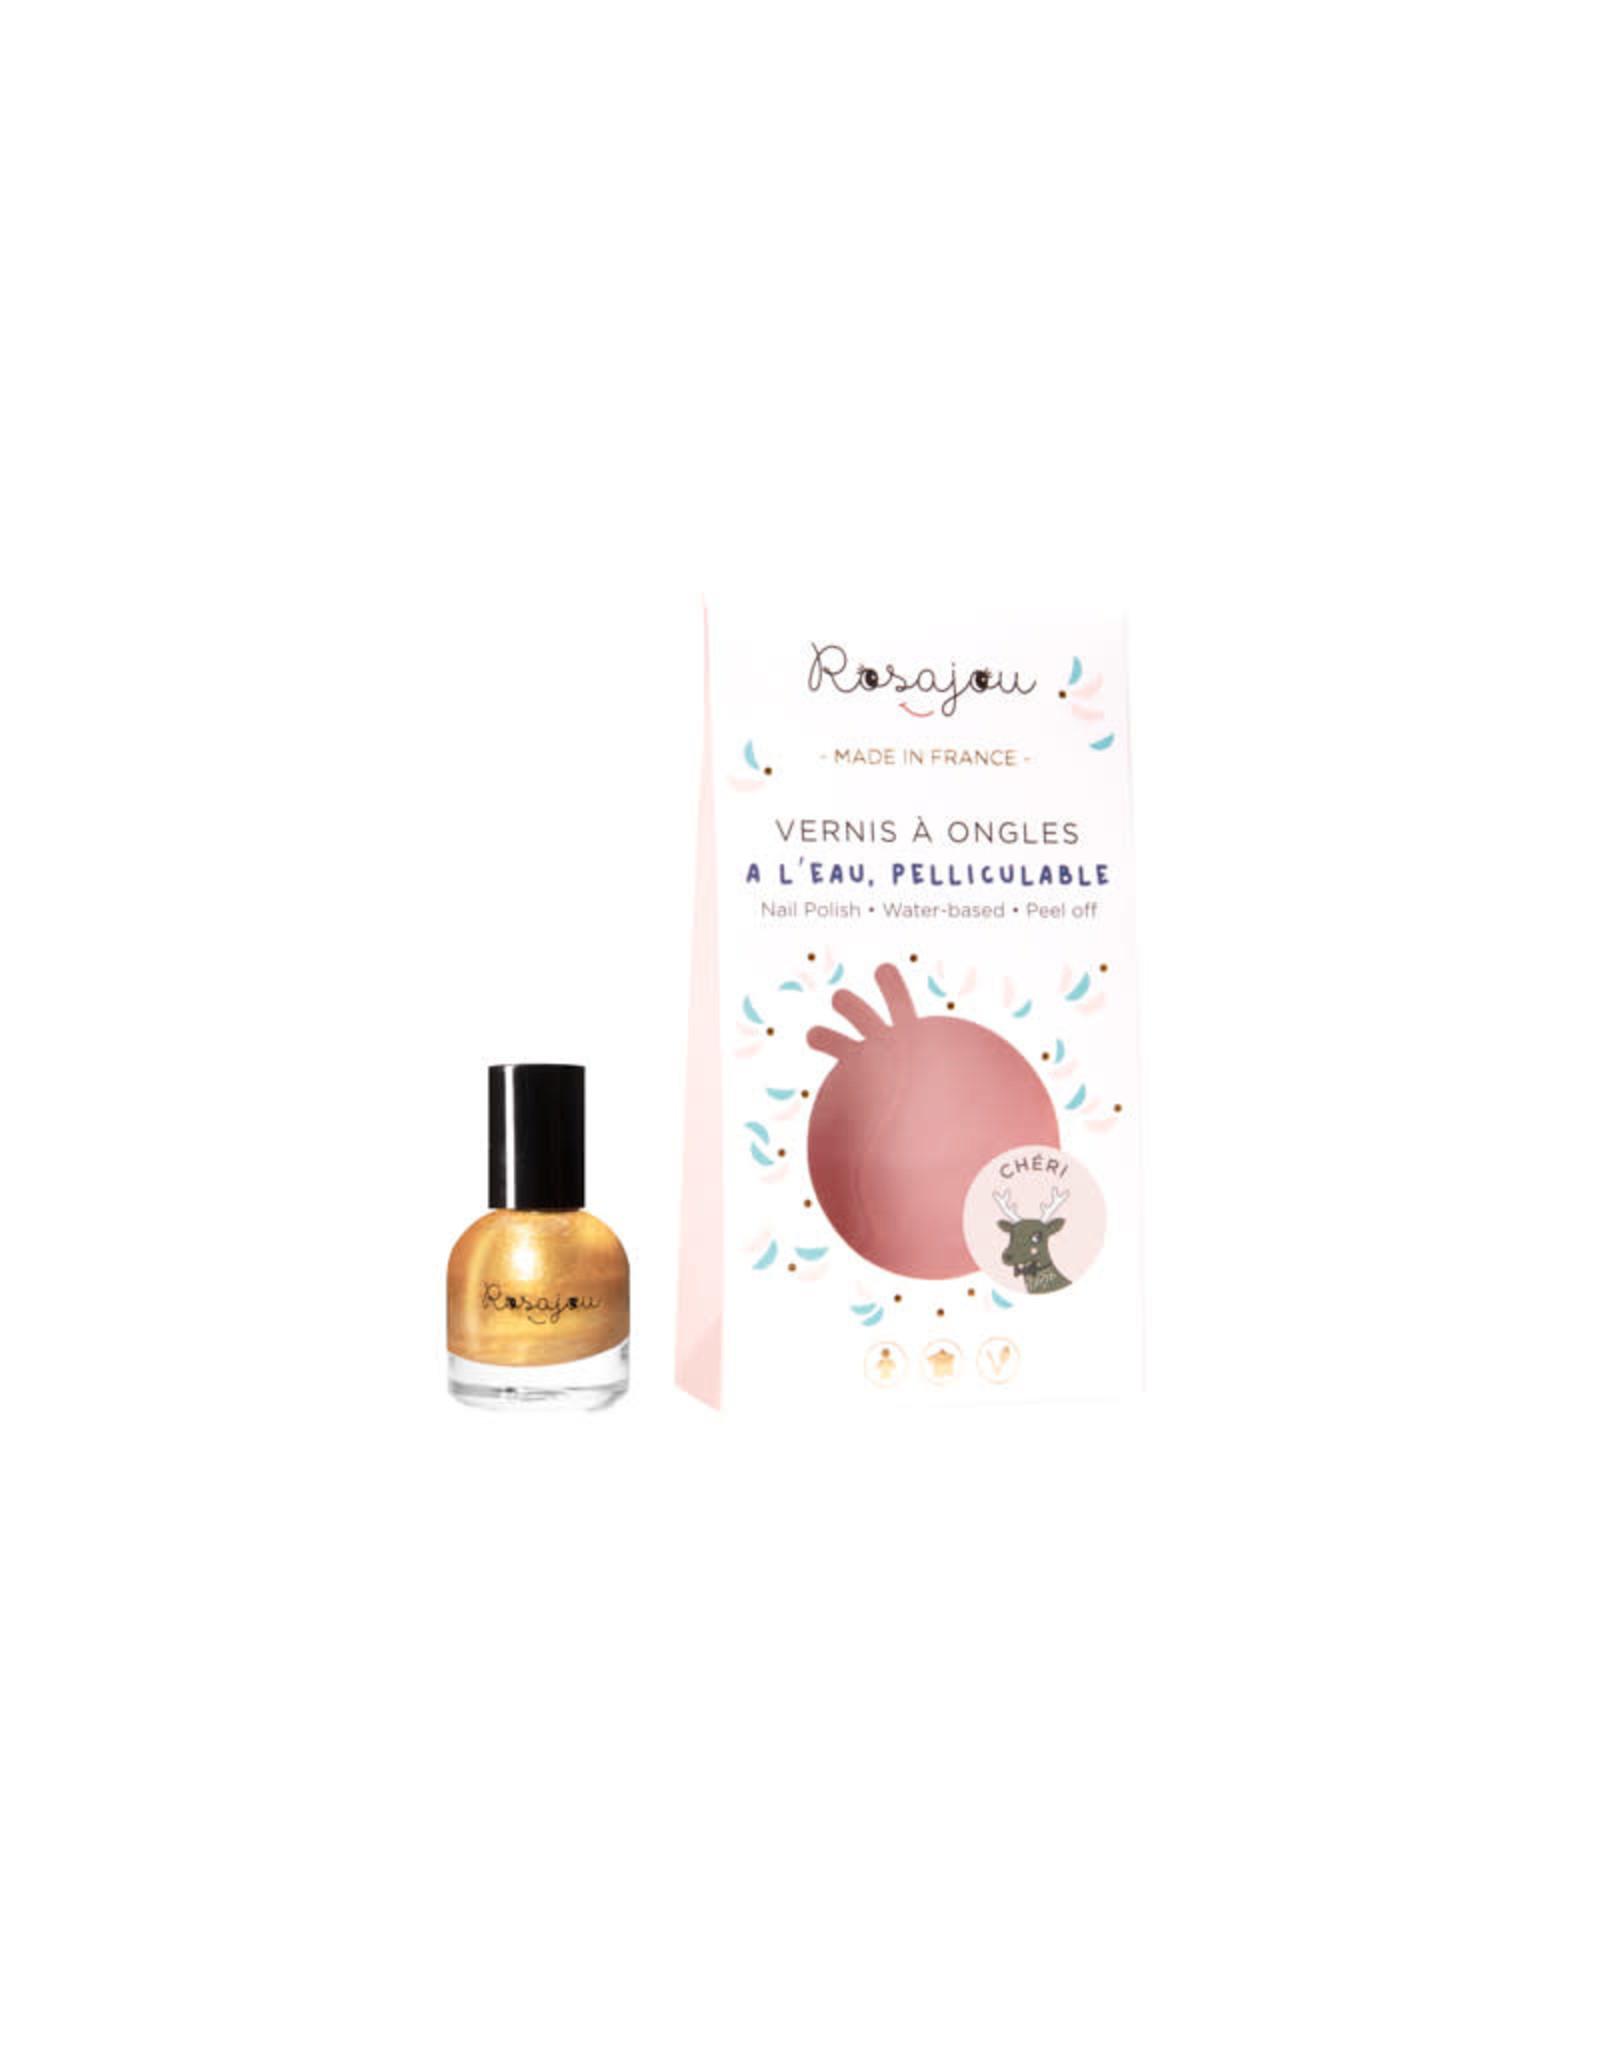 Rosajou nail polish gold 'Cheri'